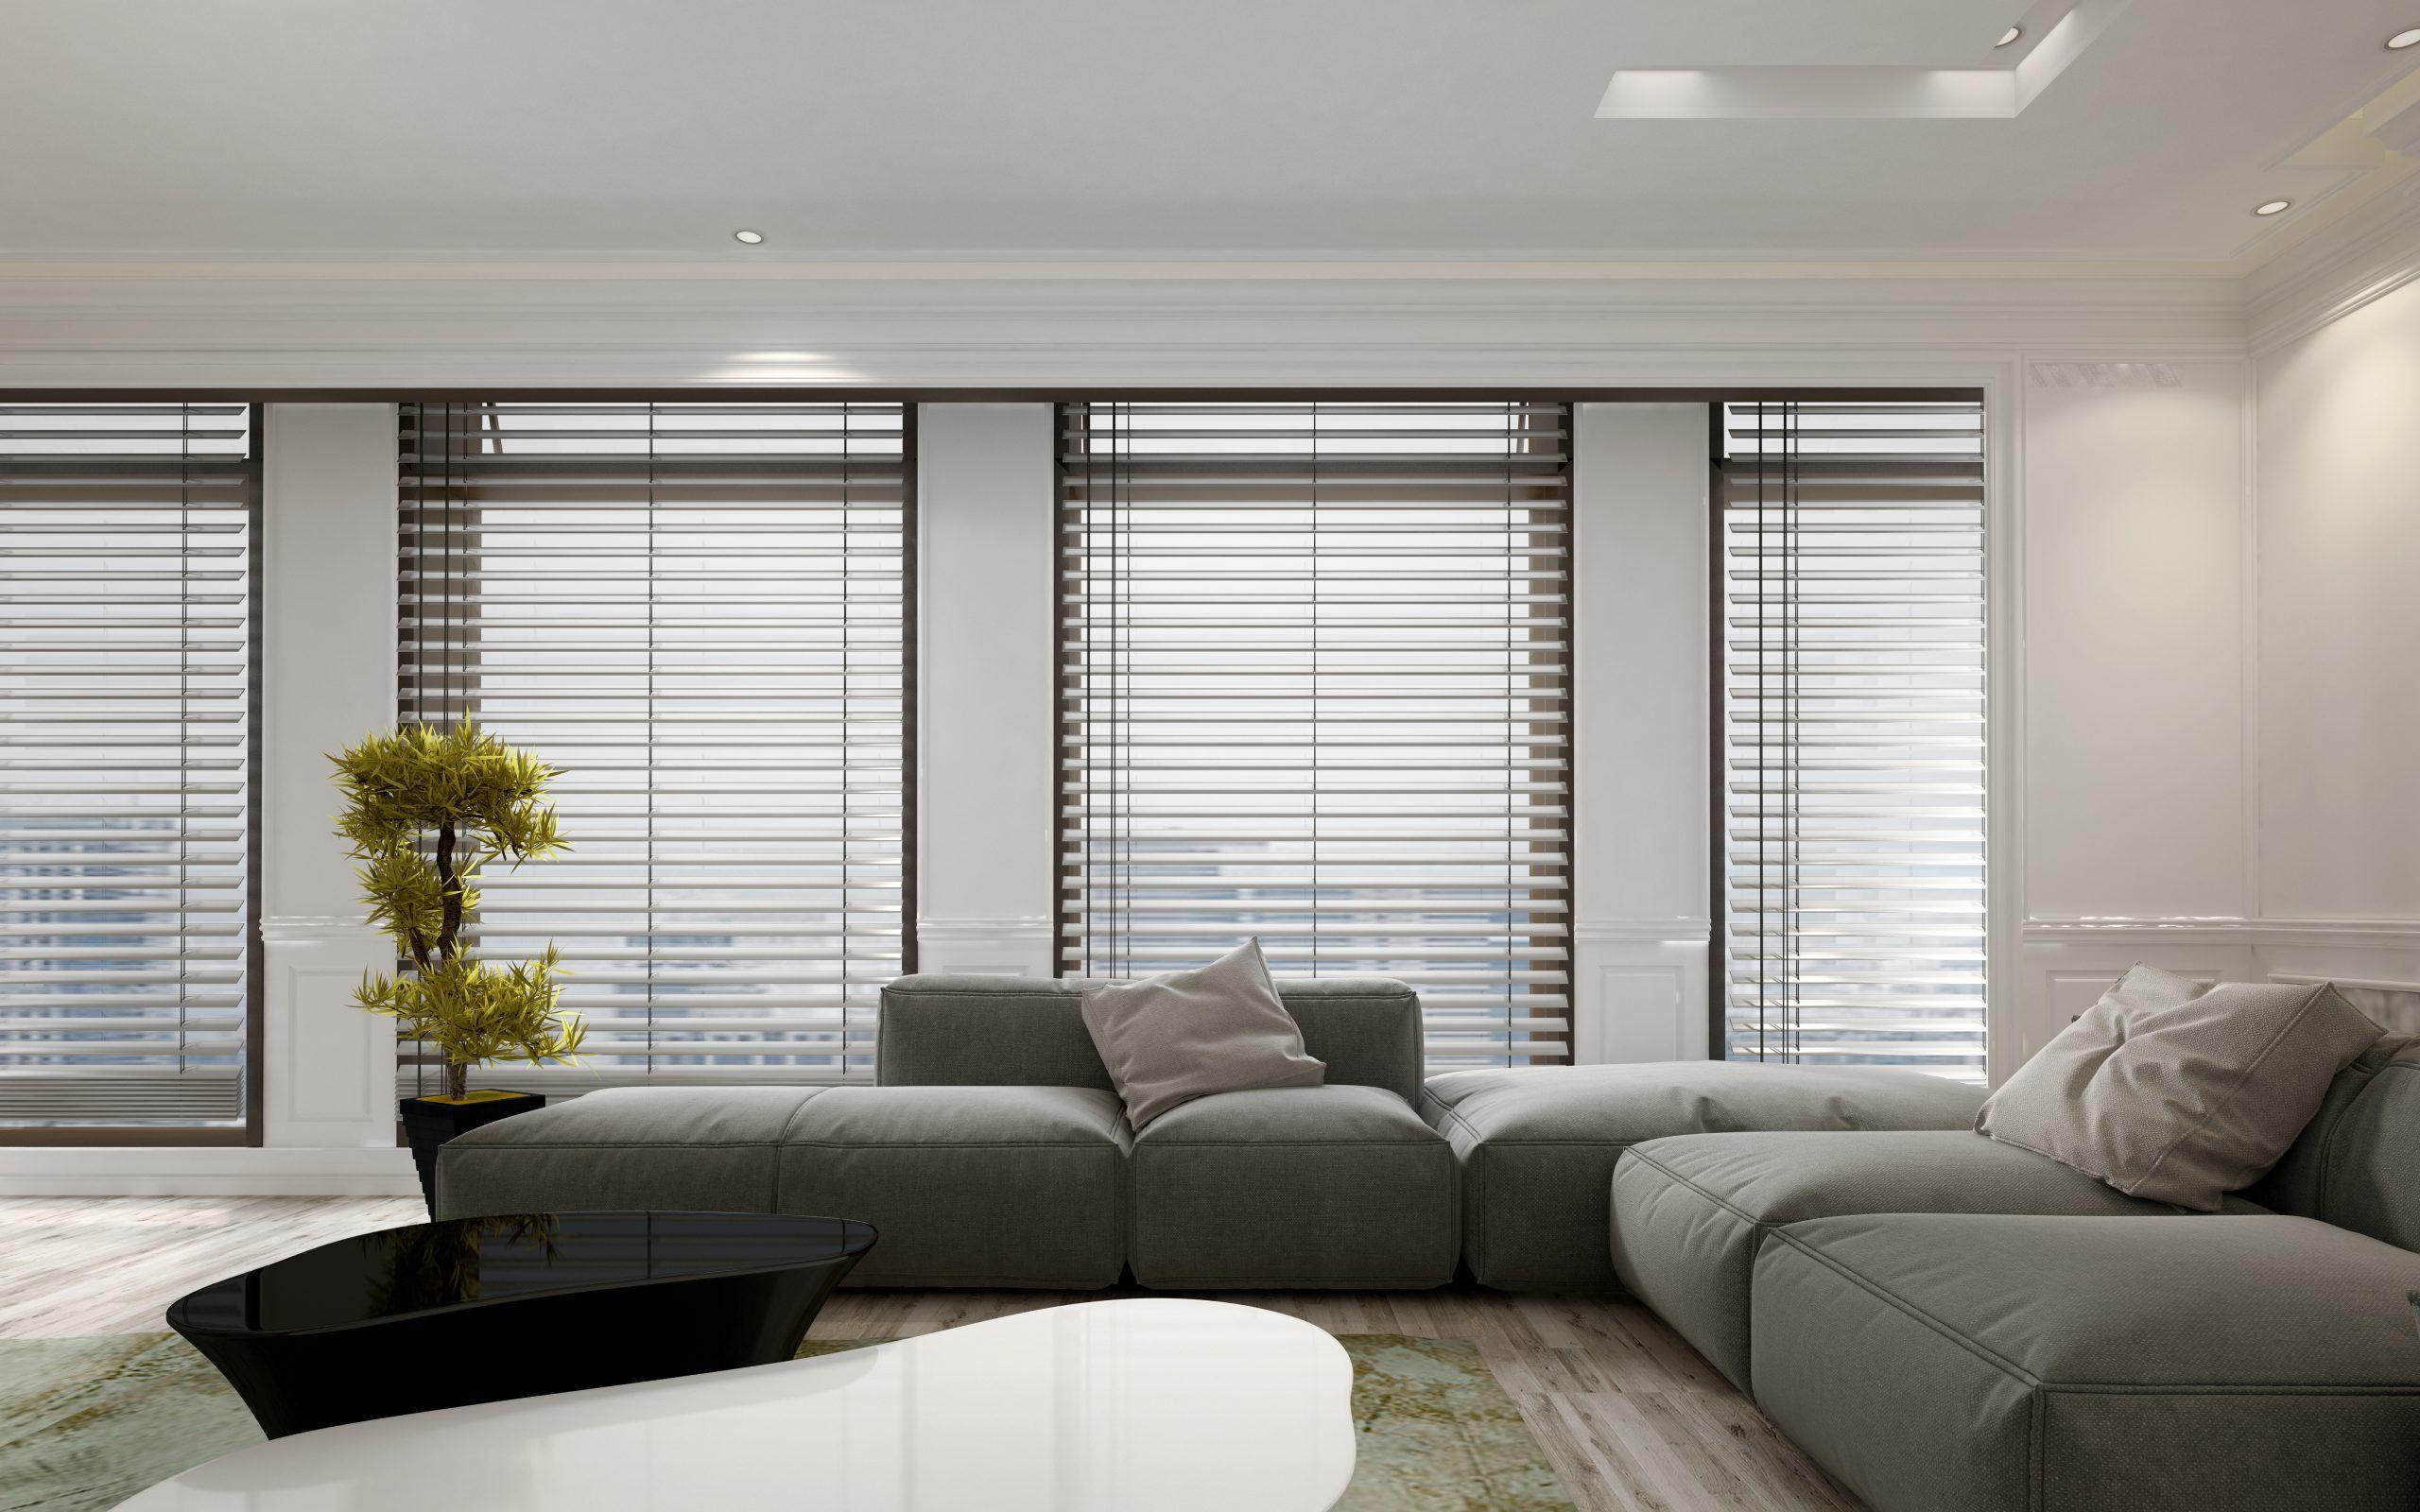 living room showing window shutters